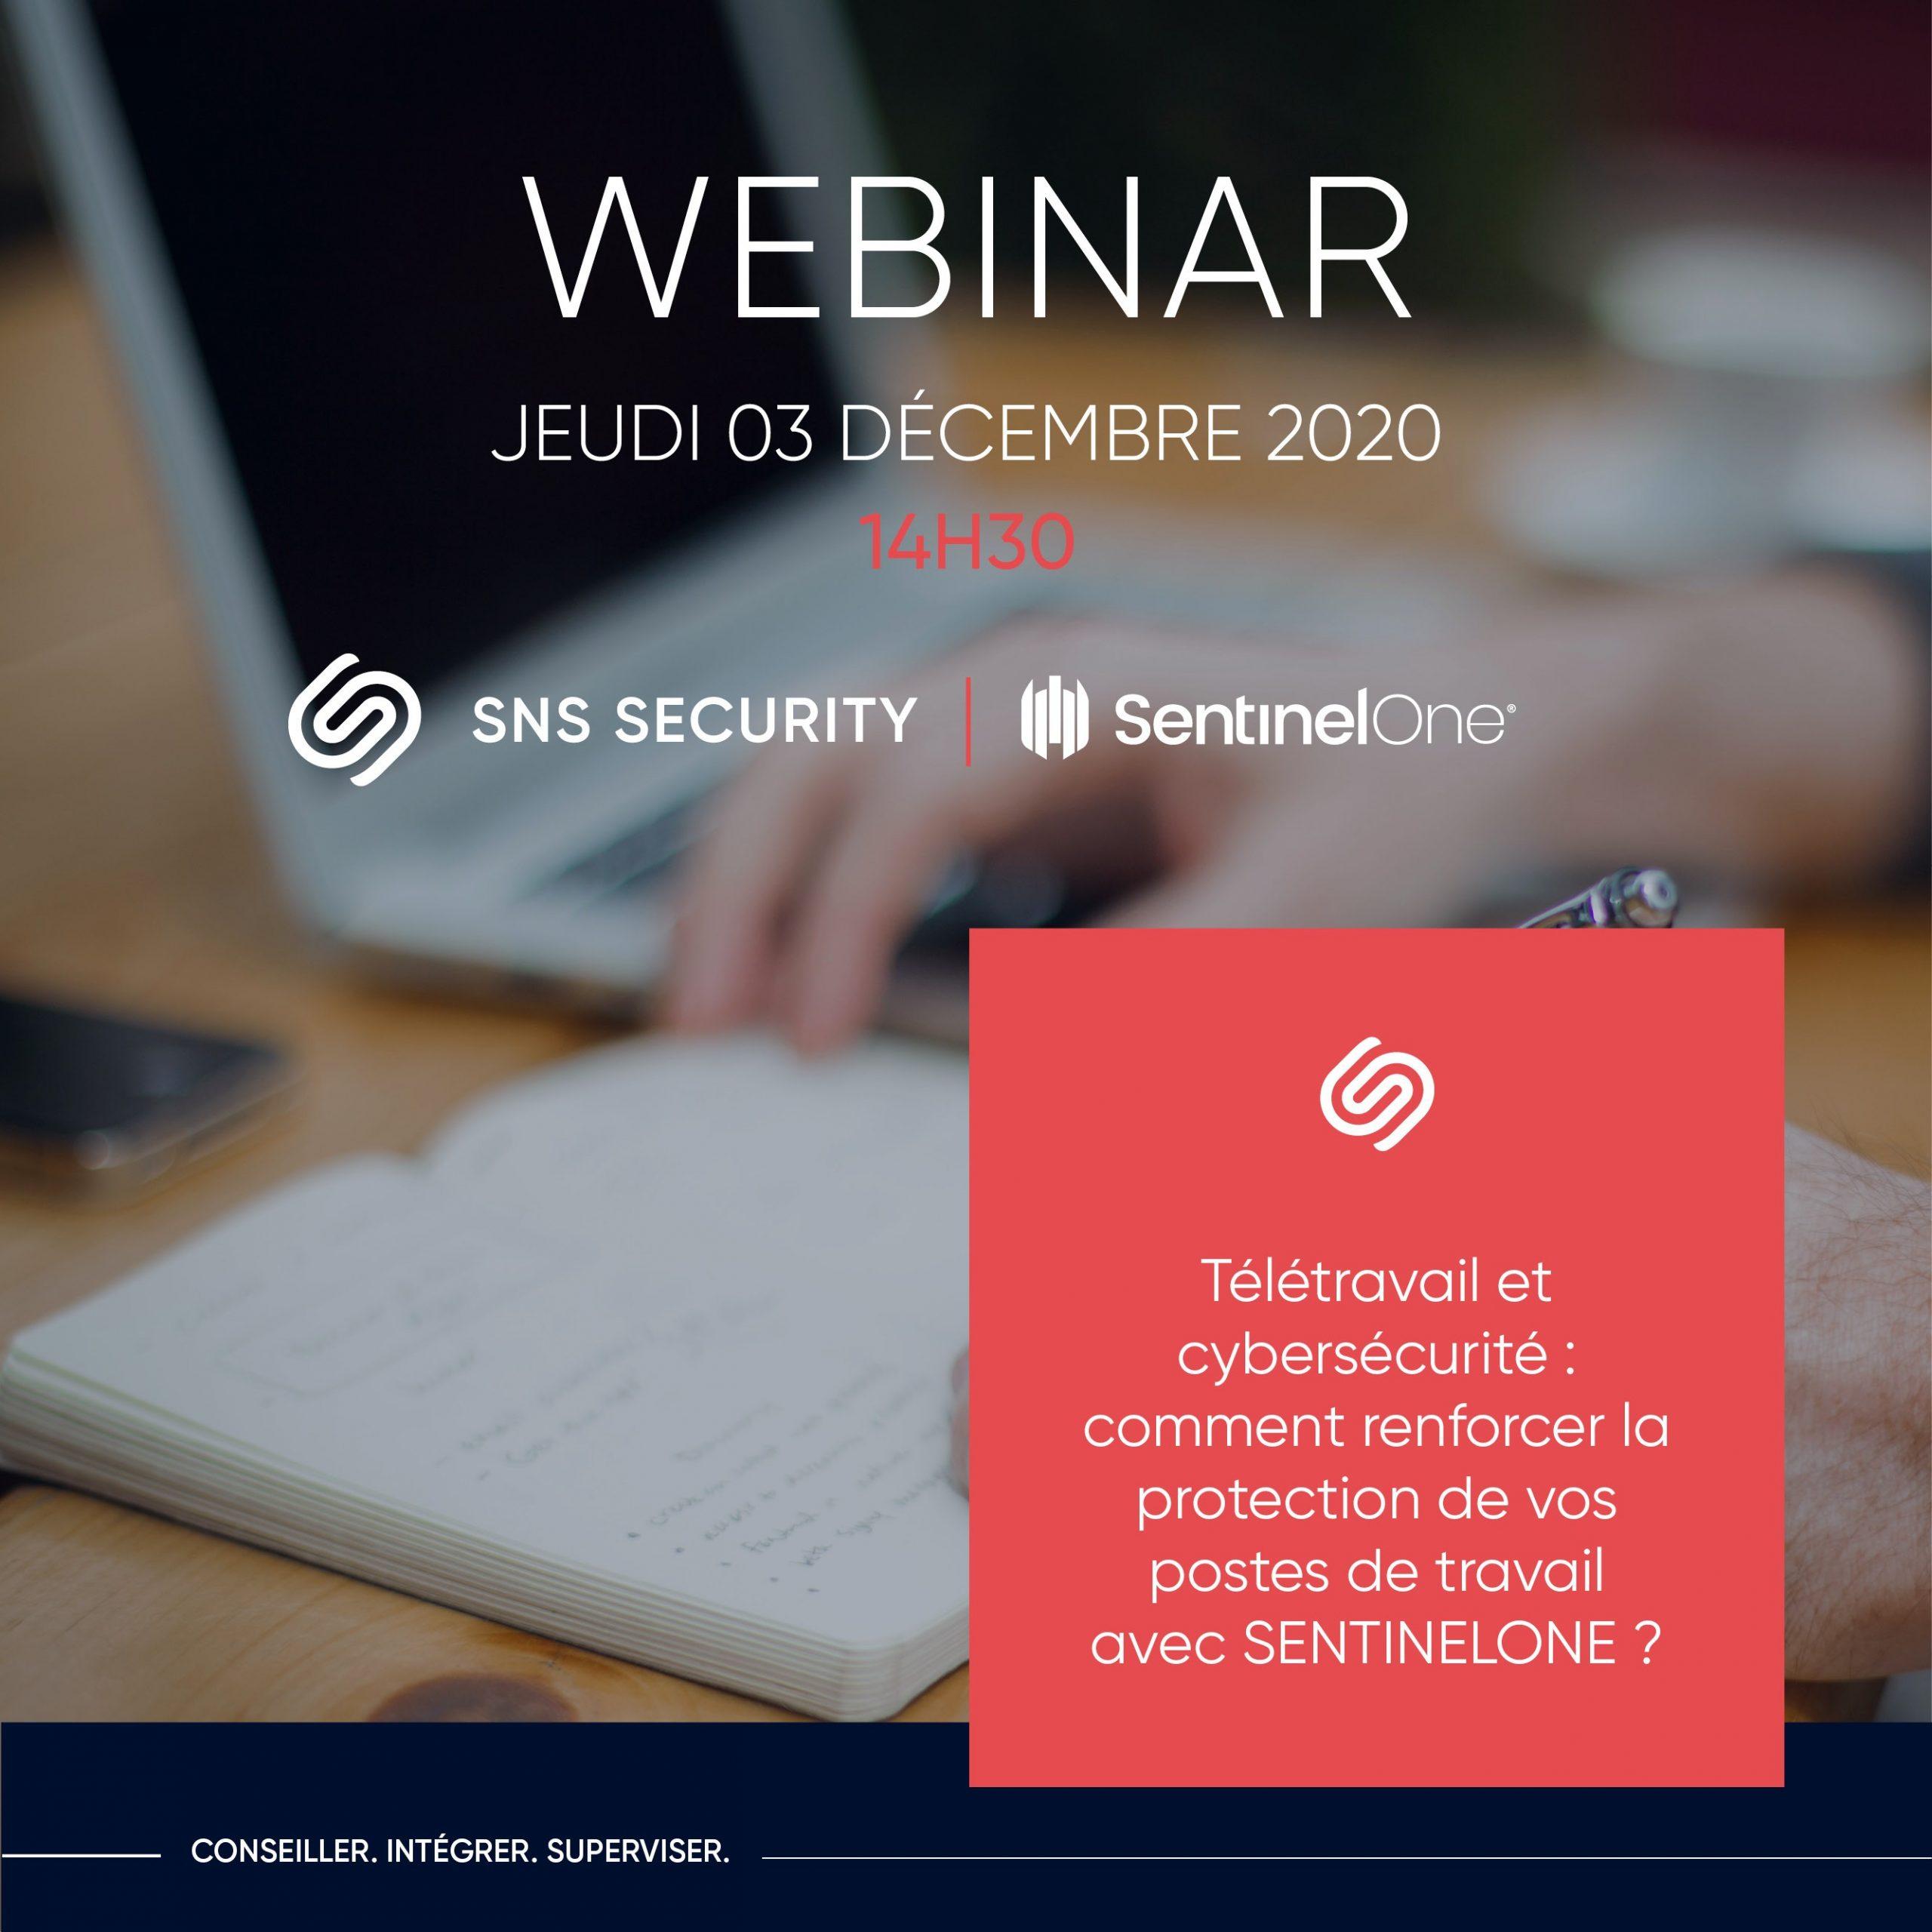 webinar sns security sentinelone protection endpoint epp edr 3 decembre 2020